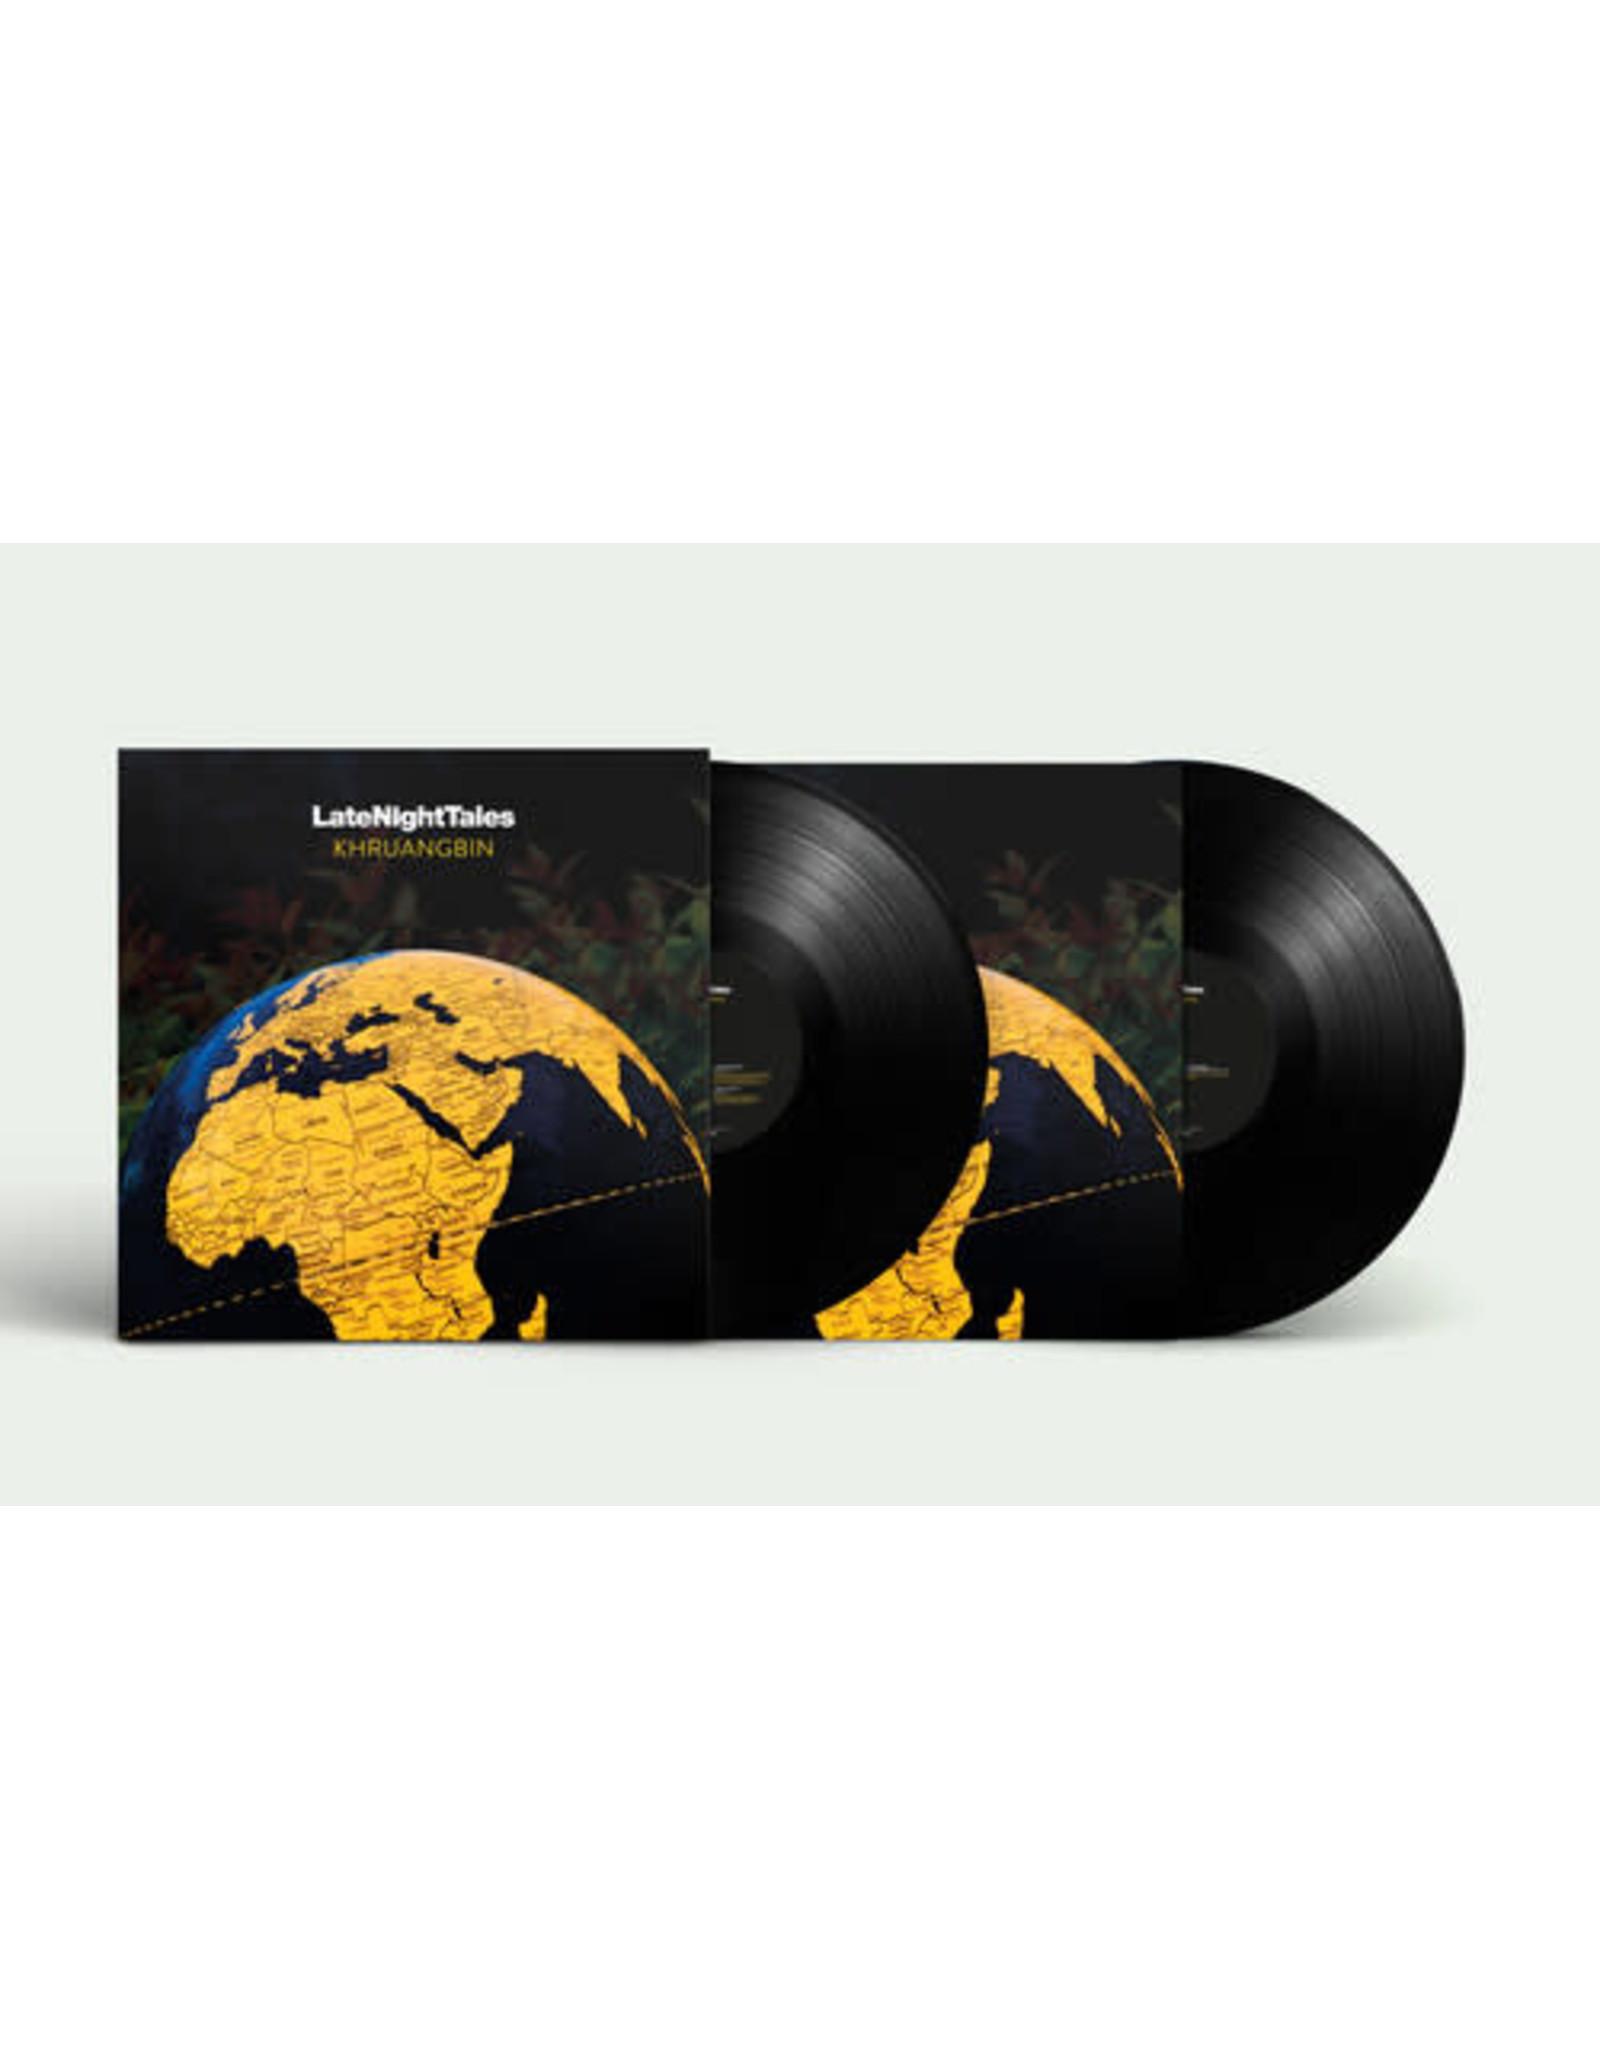 New Vinyl Khruangbin - LateNightTales 2LP